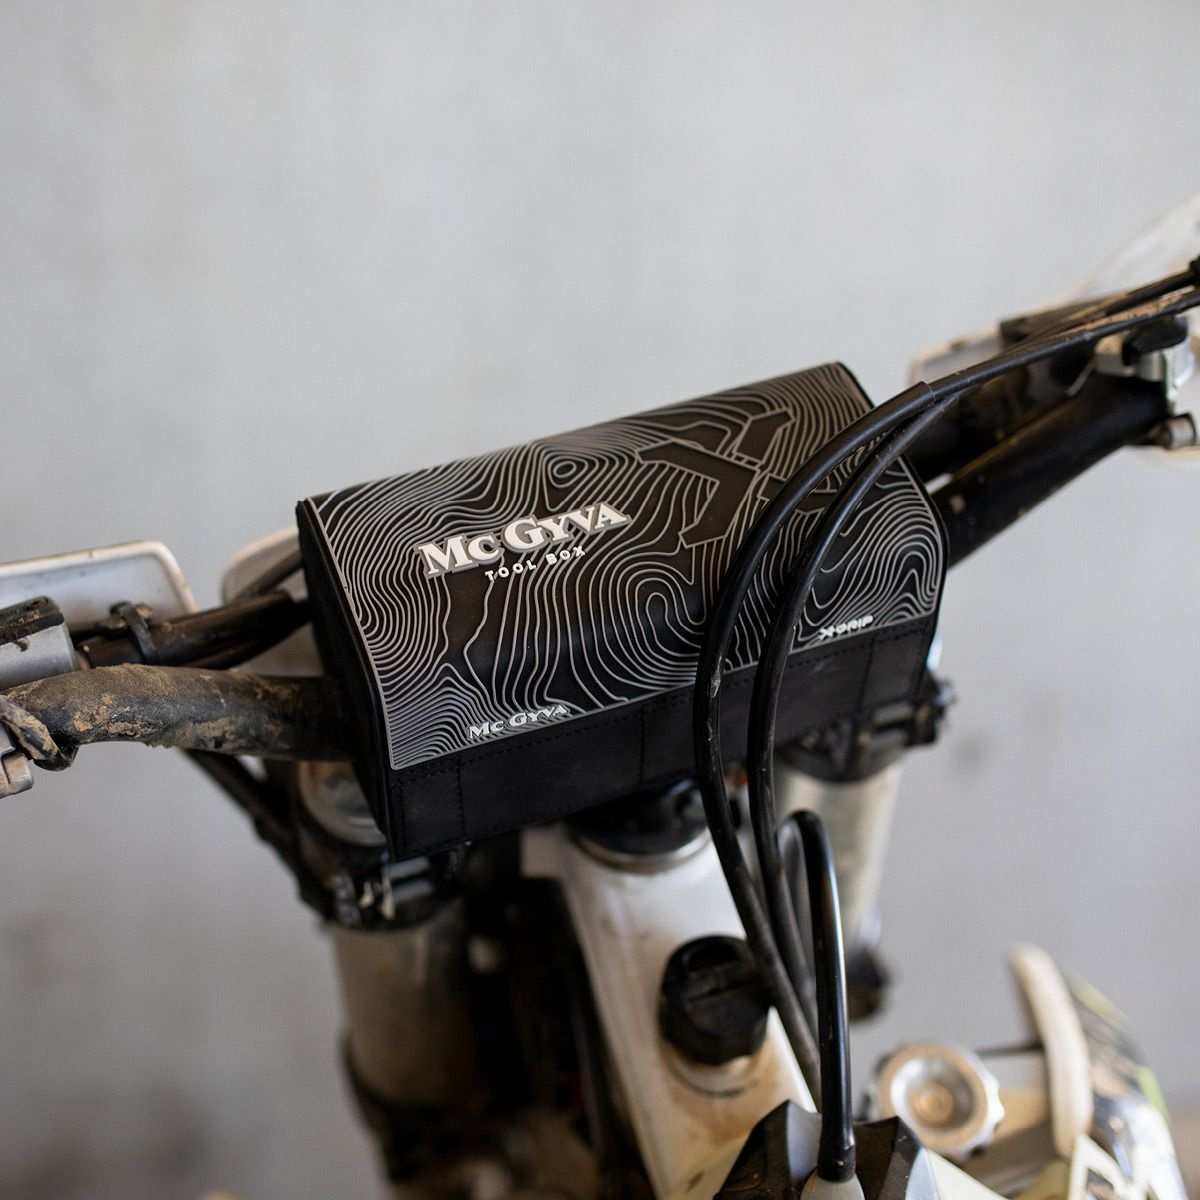 X-GRIP Mc Gyva Tool Box